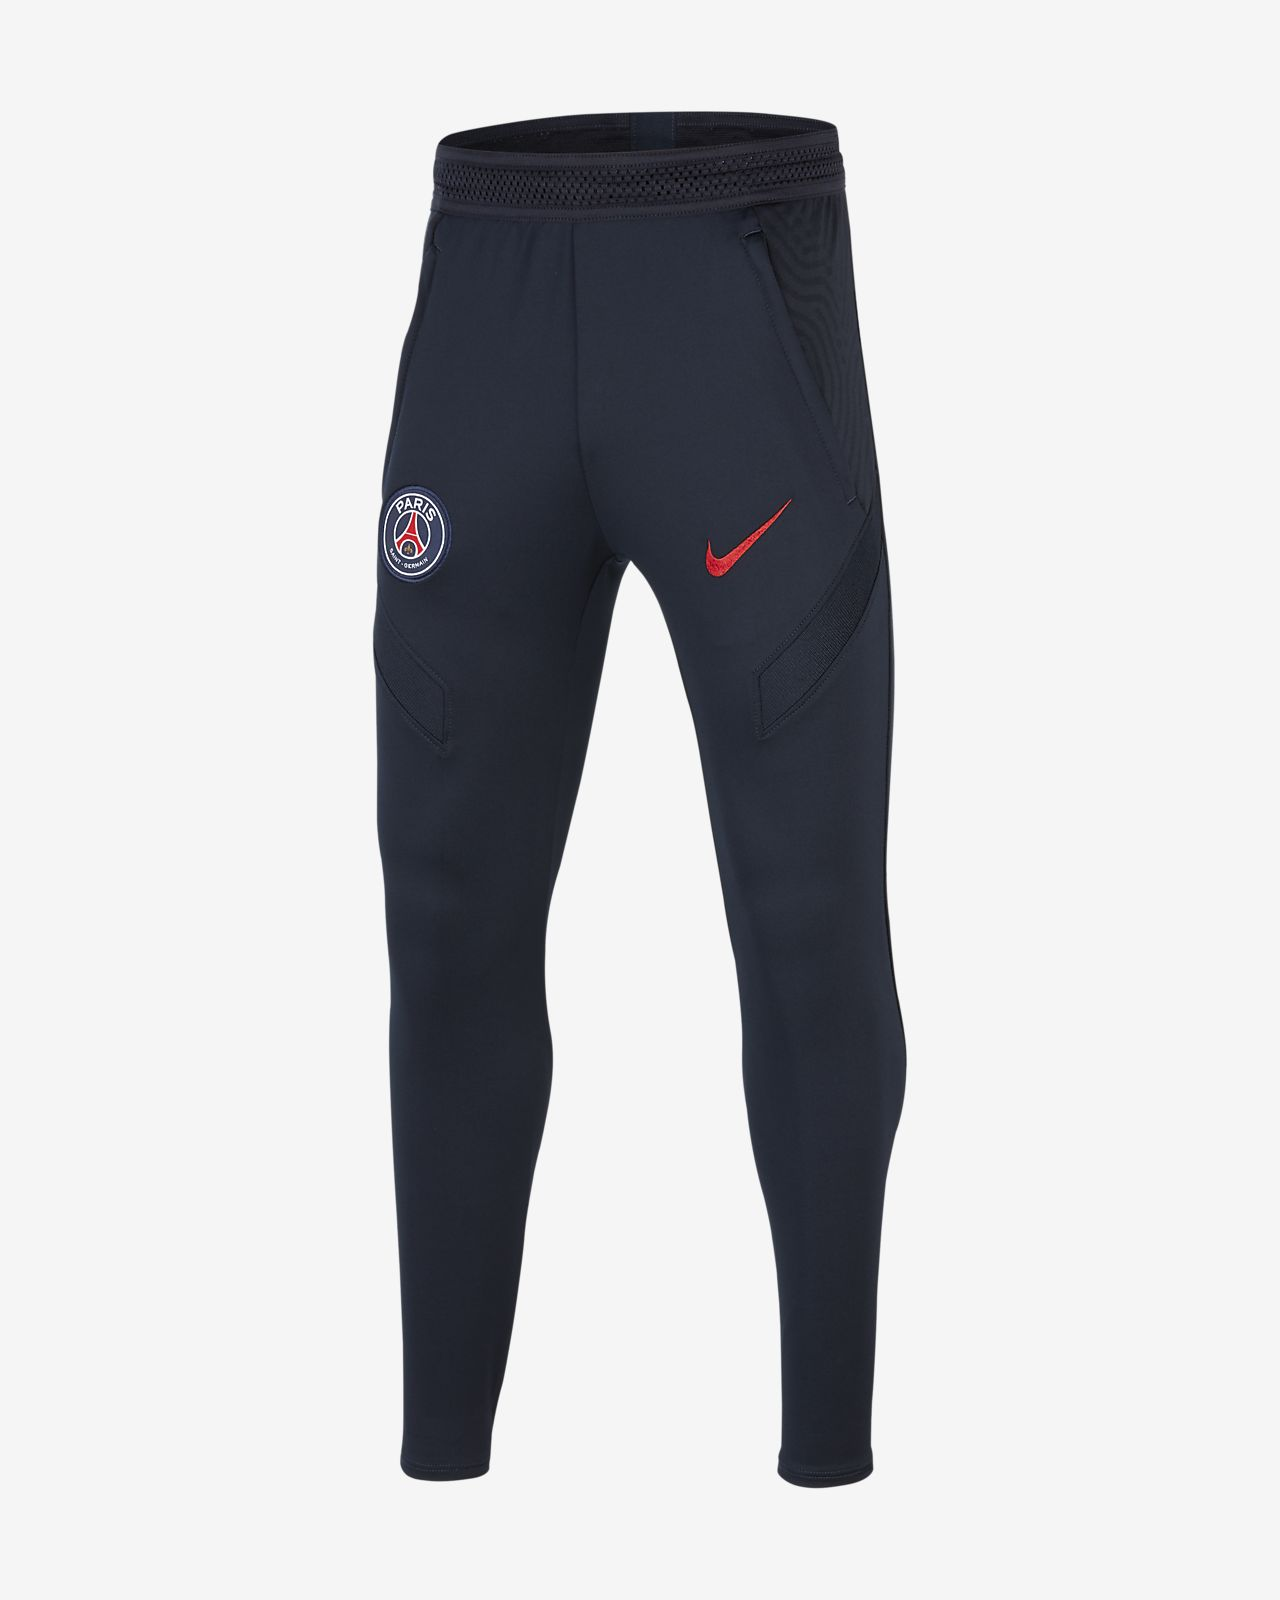 Pantaloni da calcio Paris Saint-Germain Strike - Ragazzi